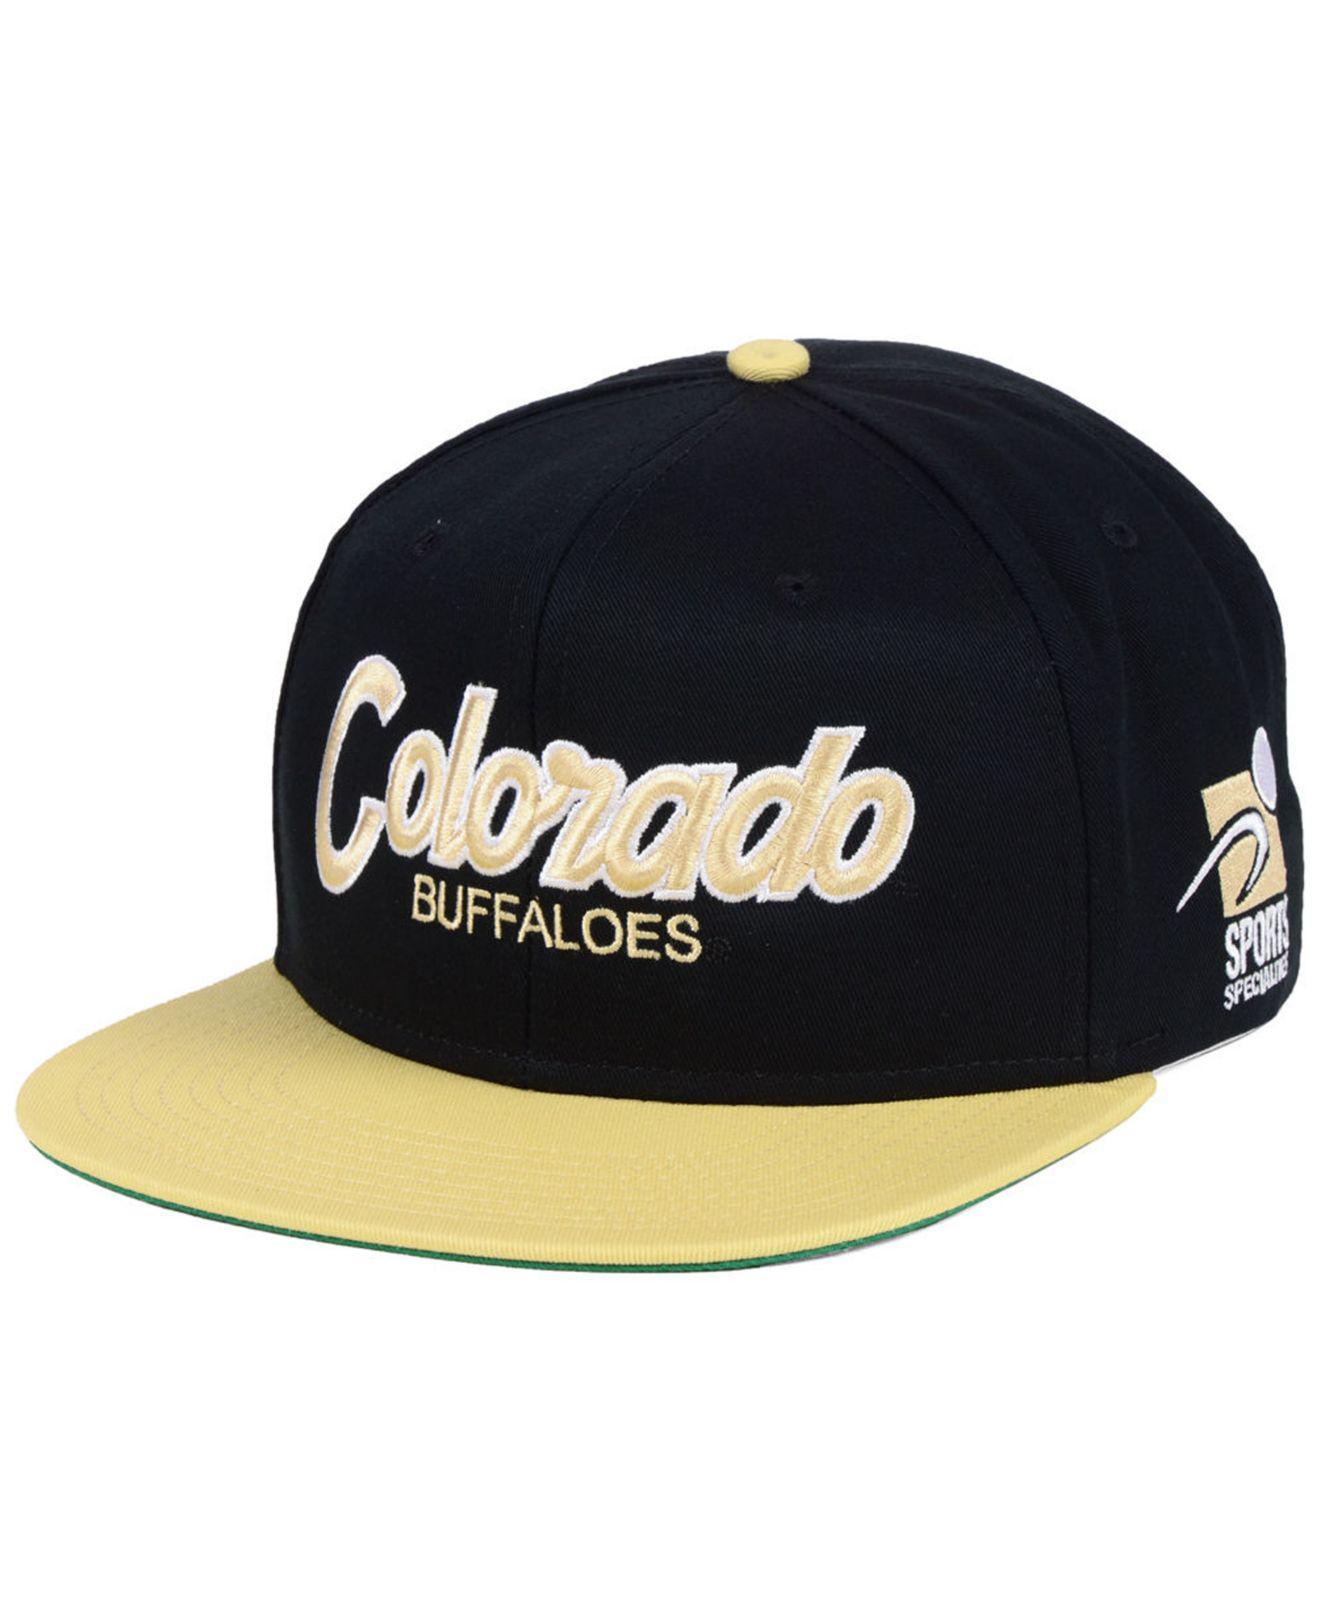 2a187b6d312 Lyst - Nike Colorado Buffaloes Sport Specialties Snapback Cap in ...